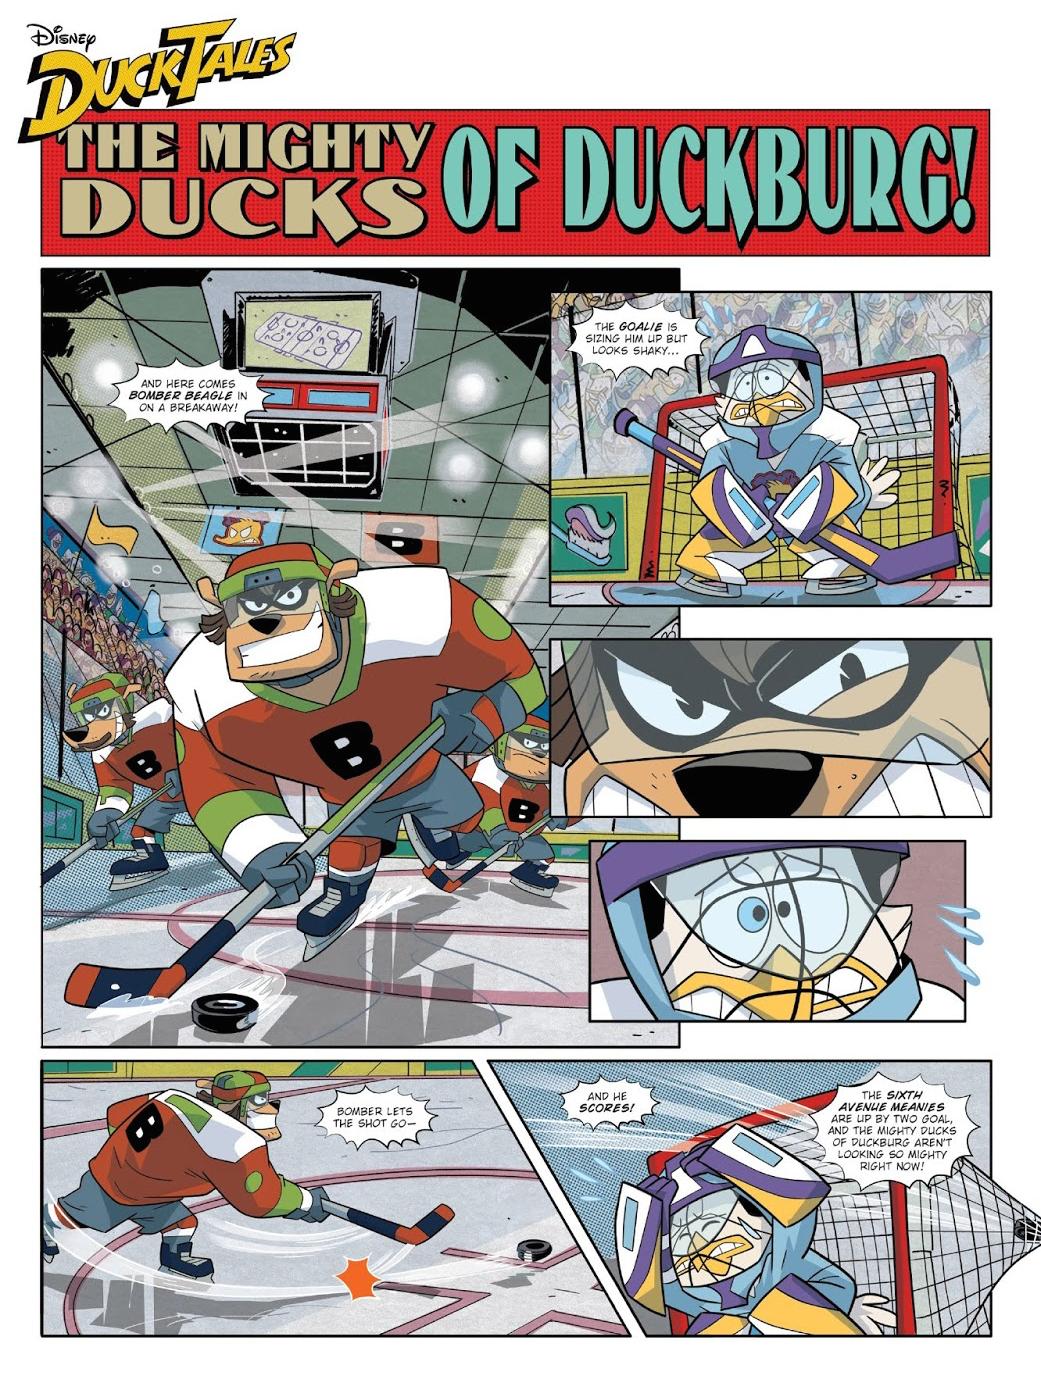 The Mighty Ducks of Duckburg